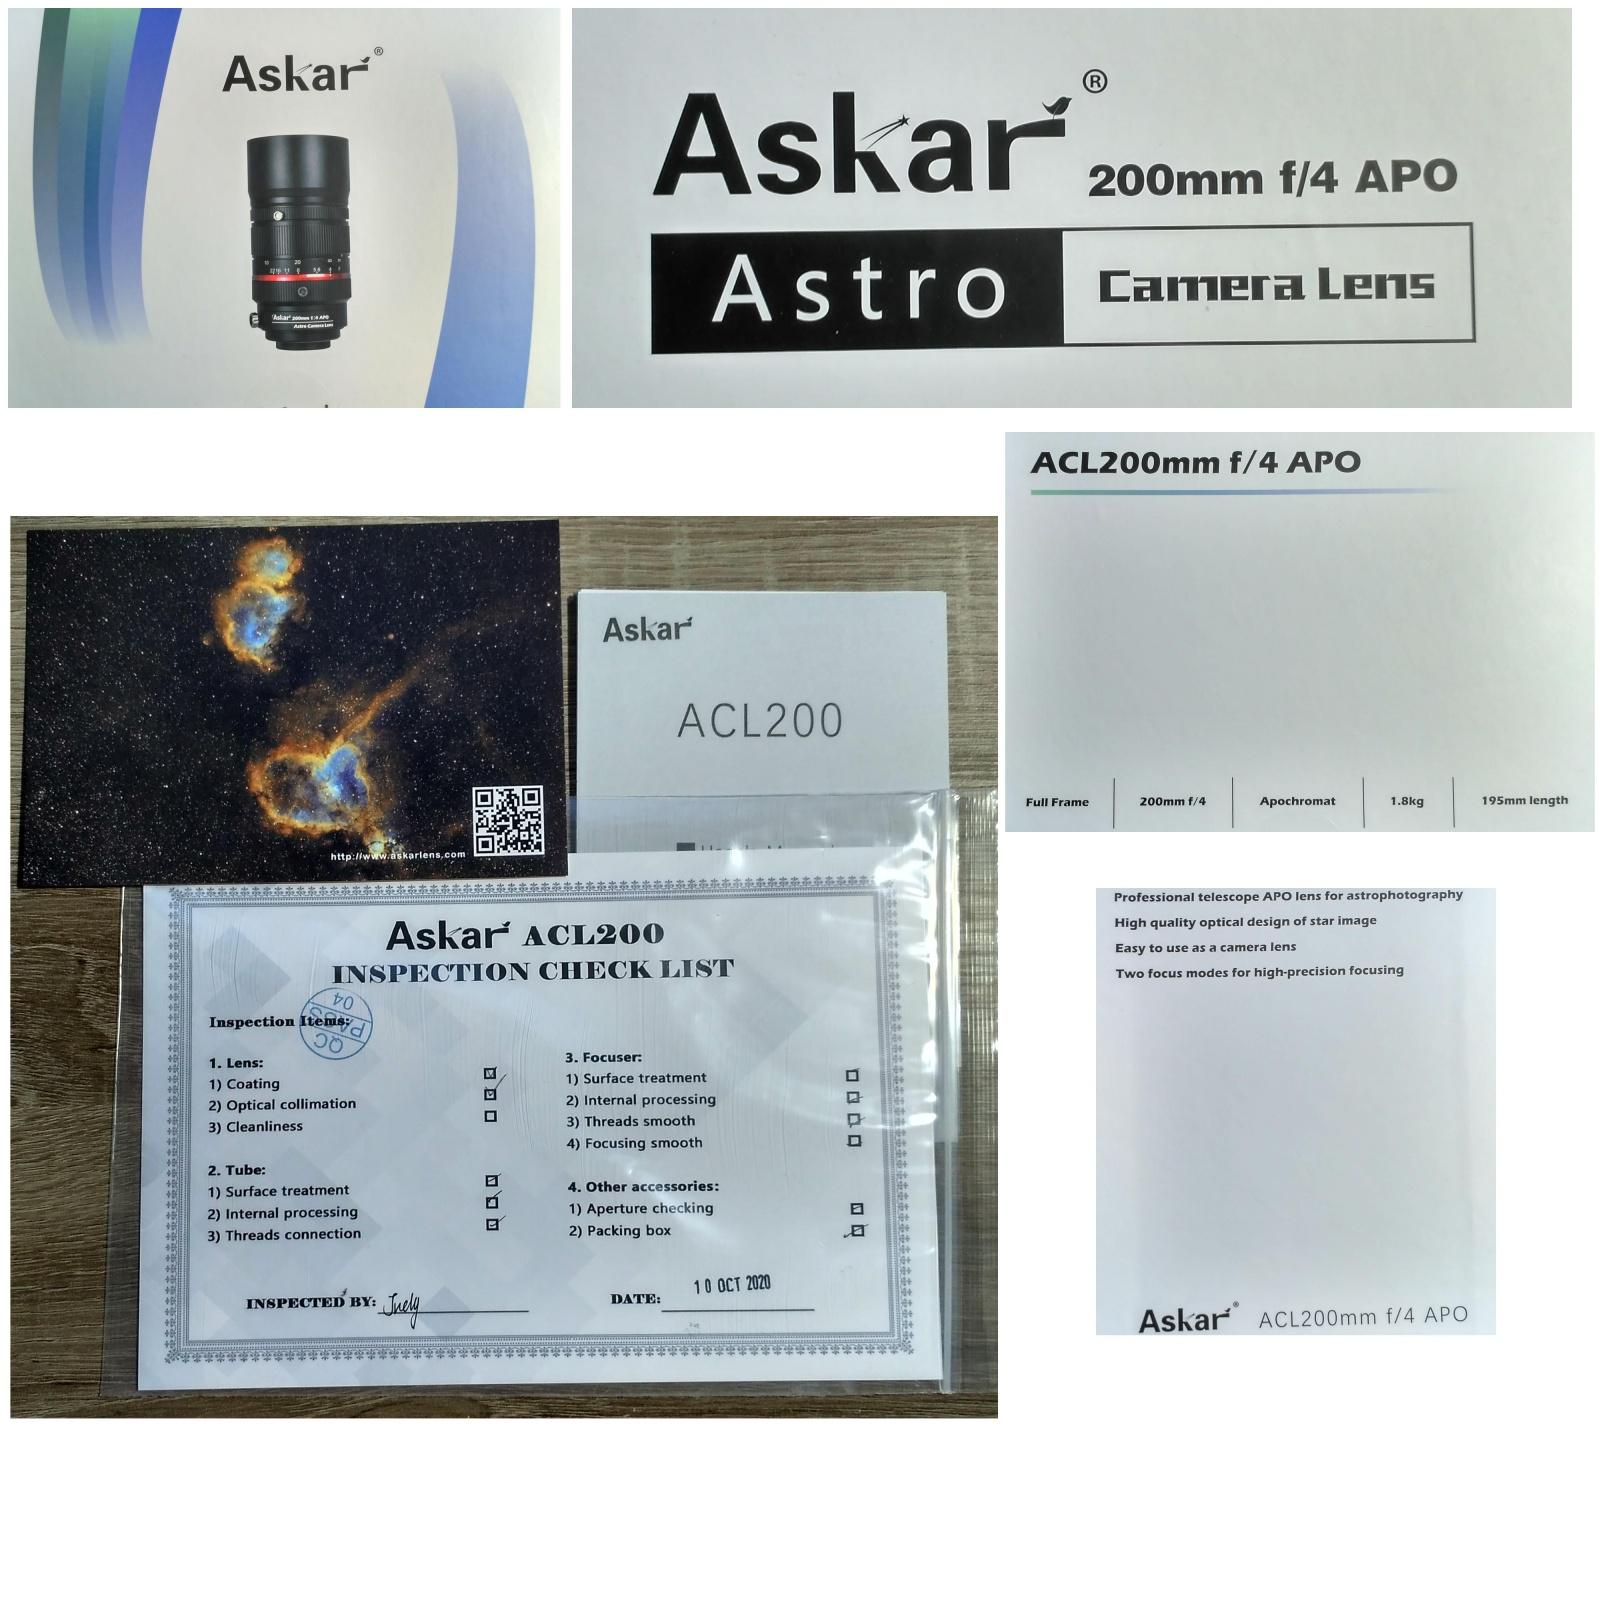 Askar_ACL200_F4_CertyfikatPudelko.jpg